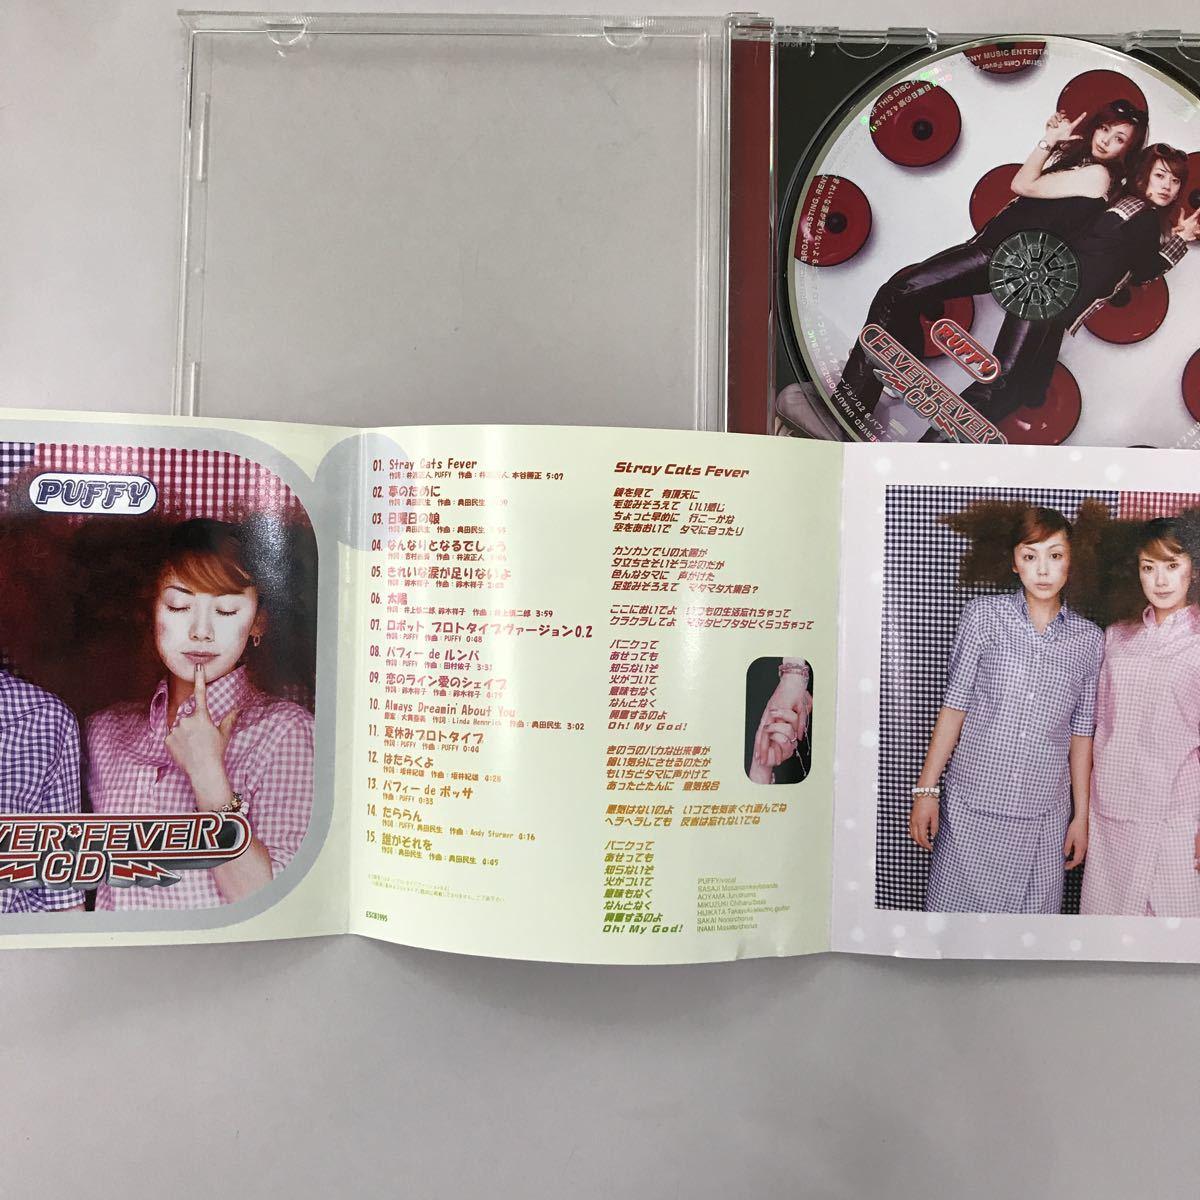 CD 中古☆【邦楽】パフィー フィーバー フィーバー